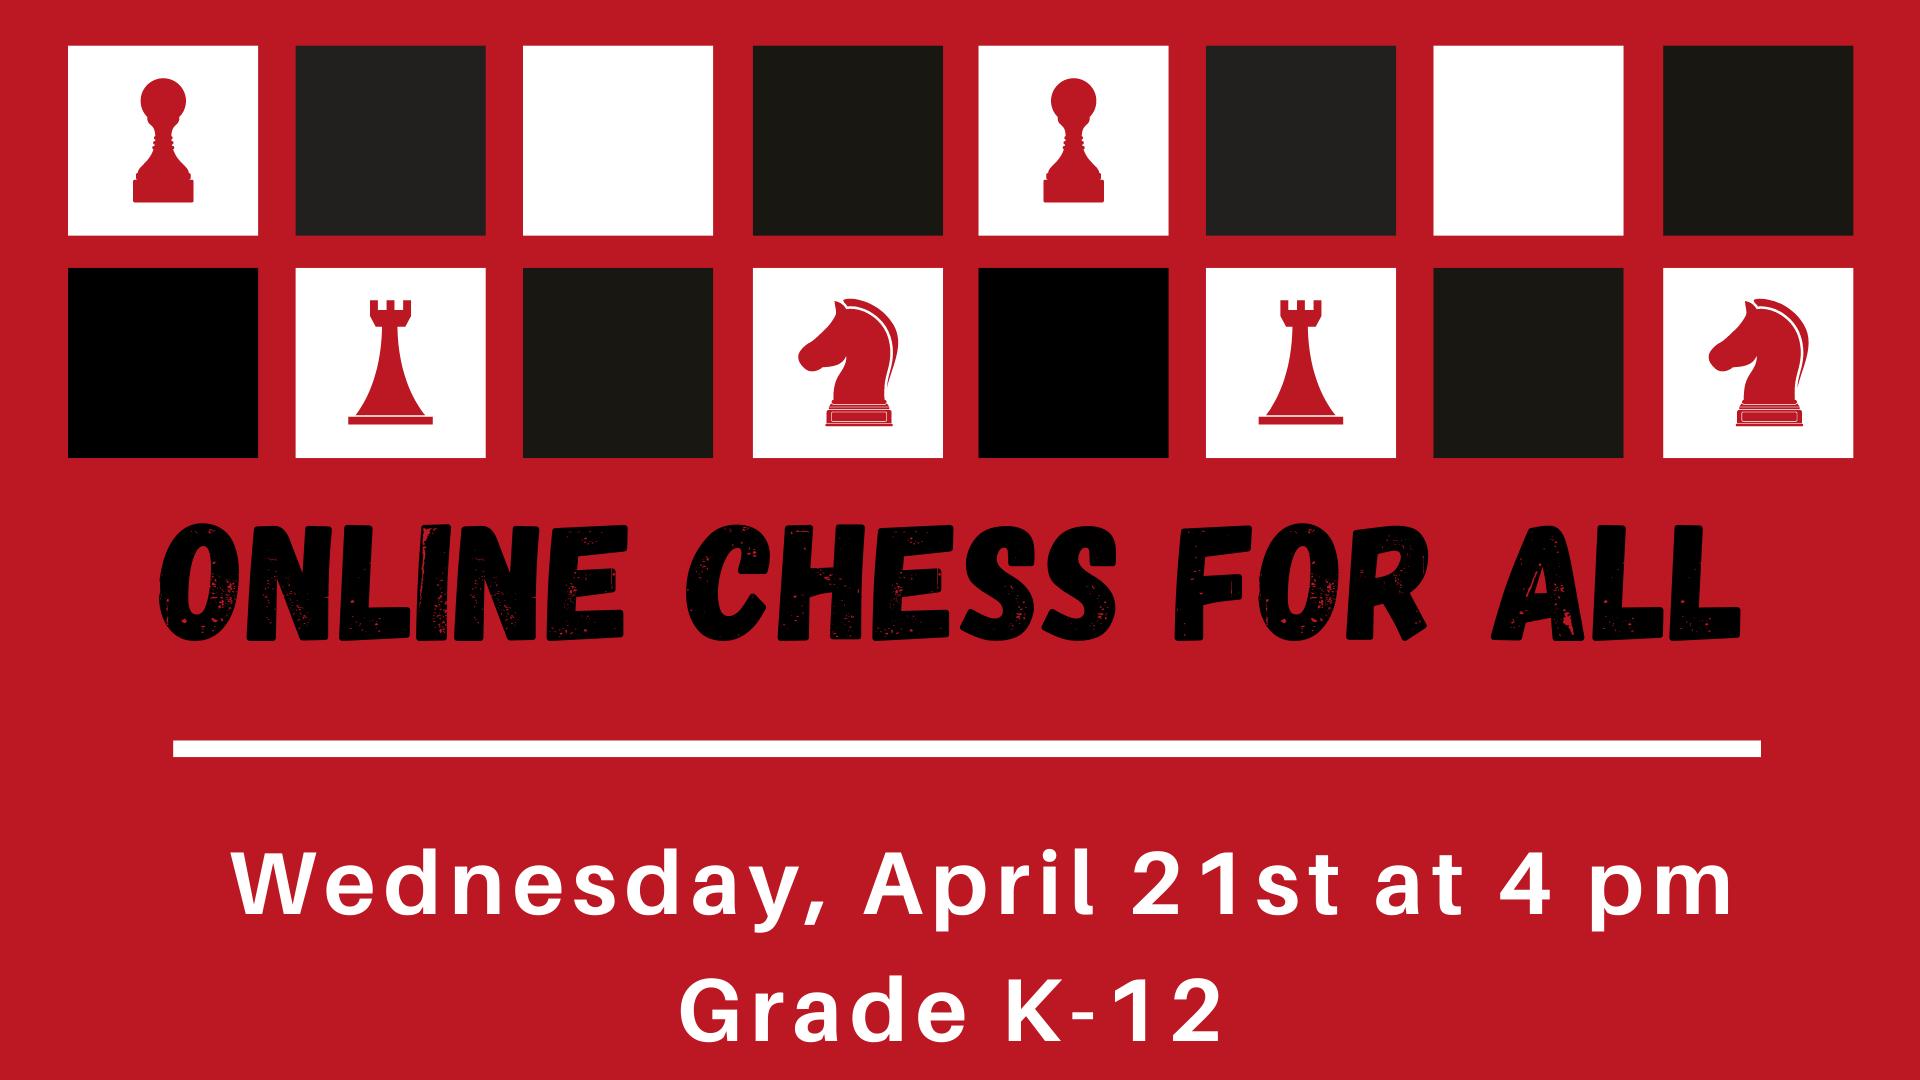 Online Chess for All -  Grades K - 12